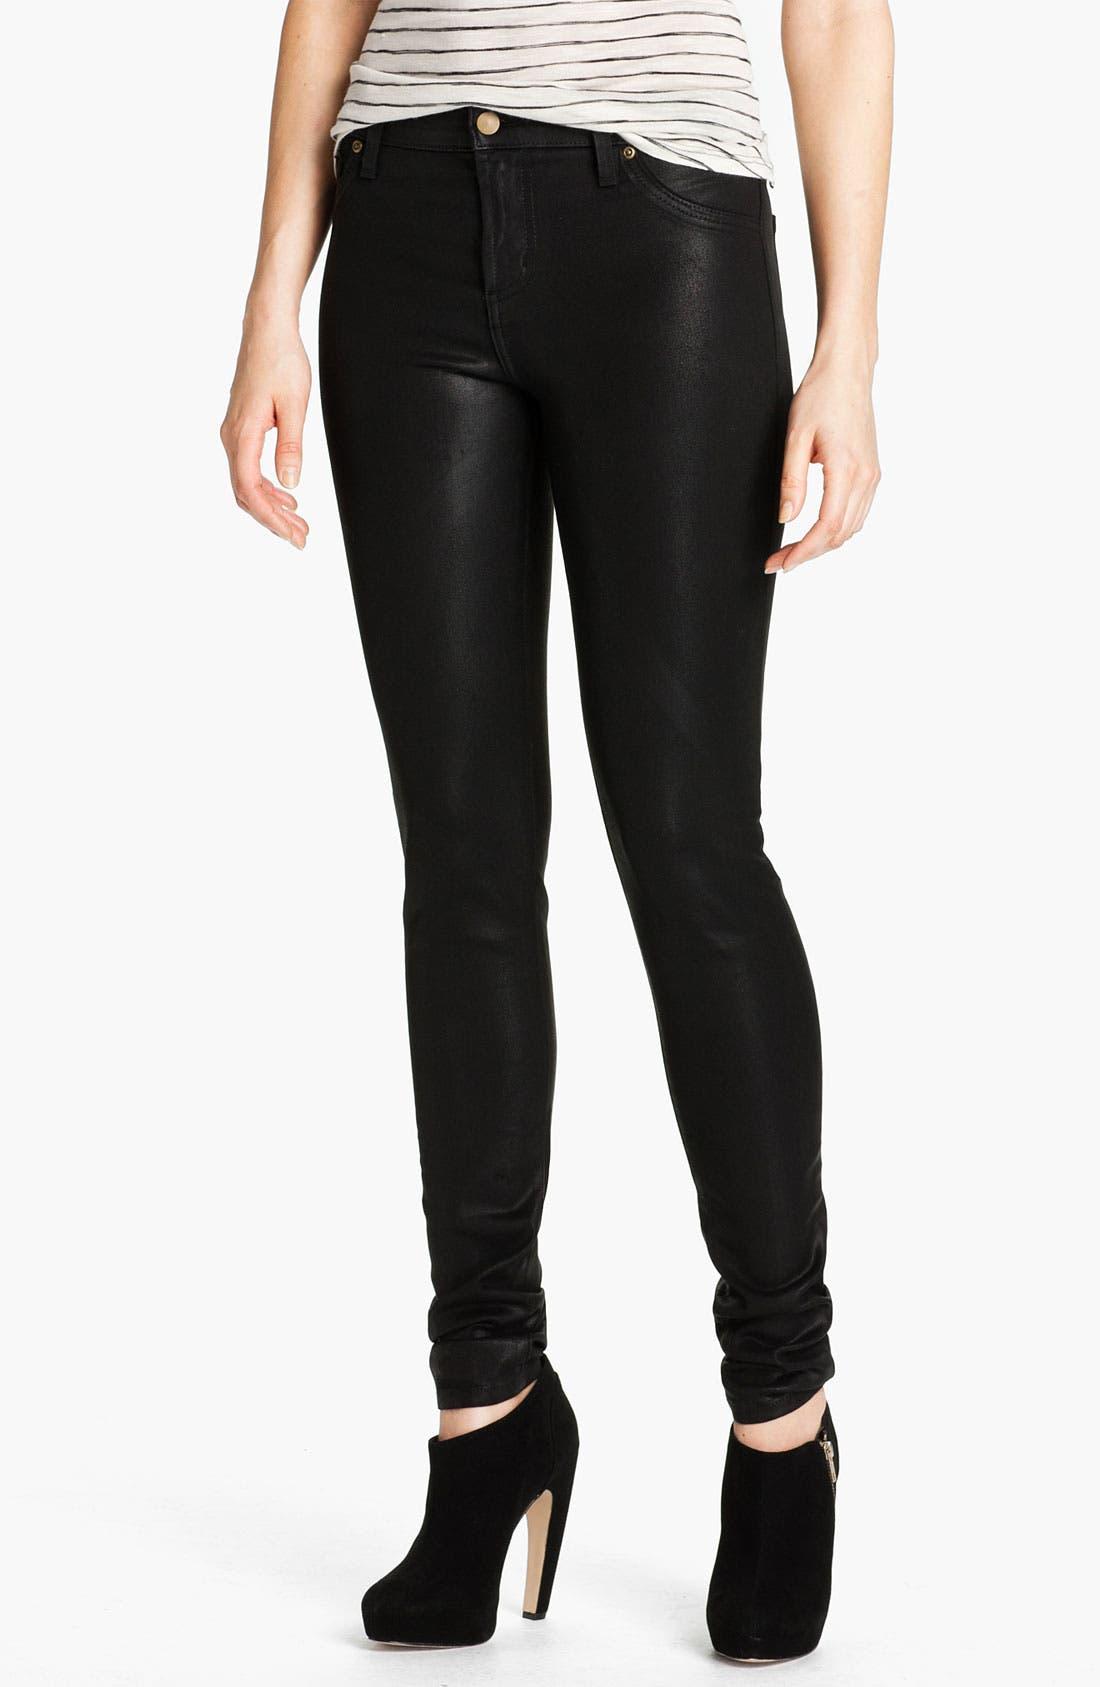 S & G Sarah & George Coated Denim Jeans, Main, color, 001